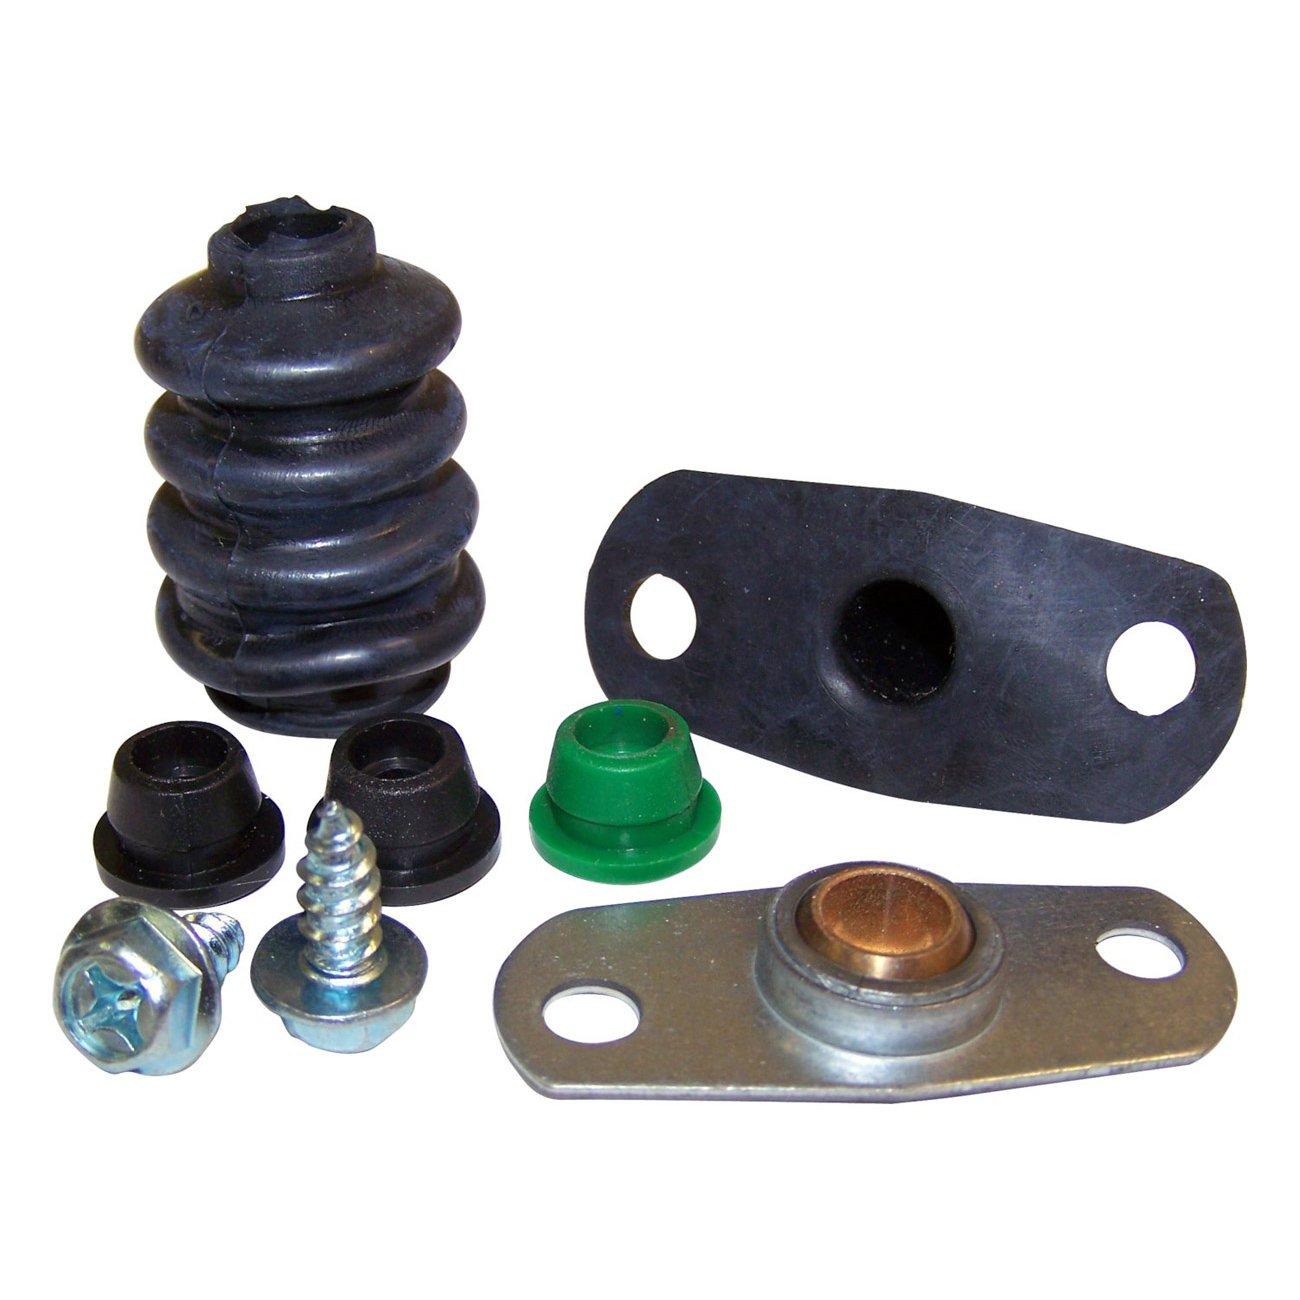 Schaltgestä nge Reparatur Kit NP 231, NP 242 Crown Automotive